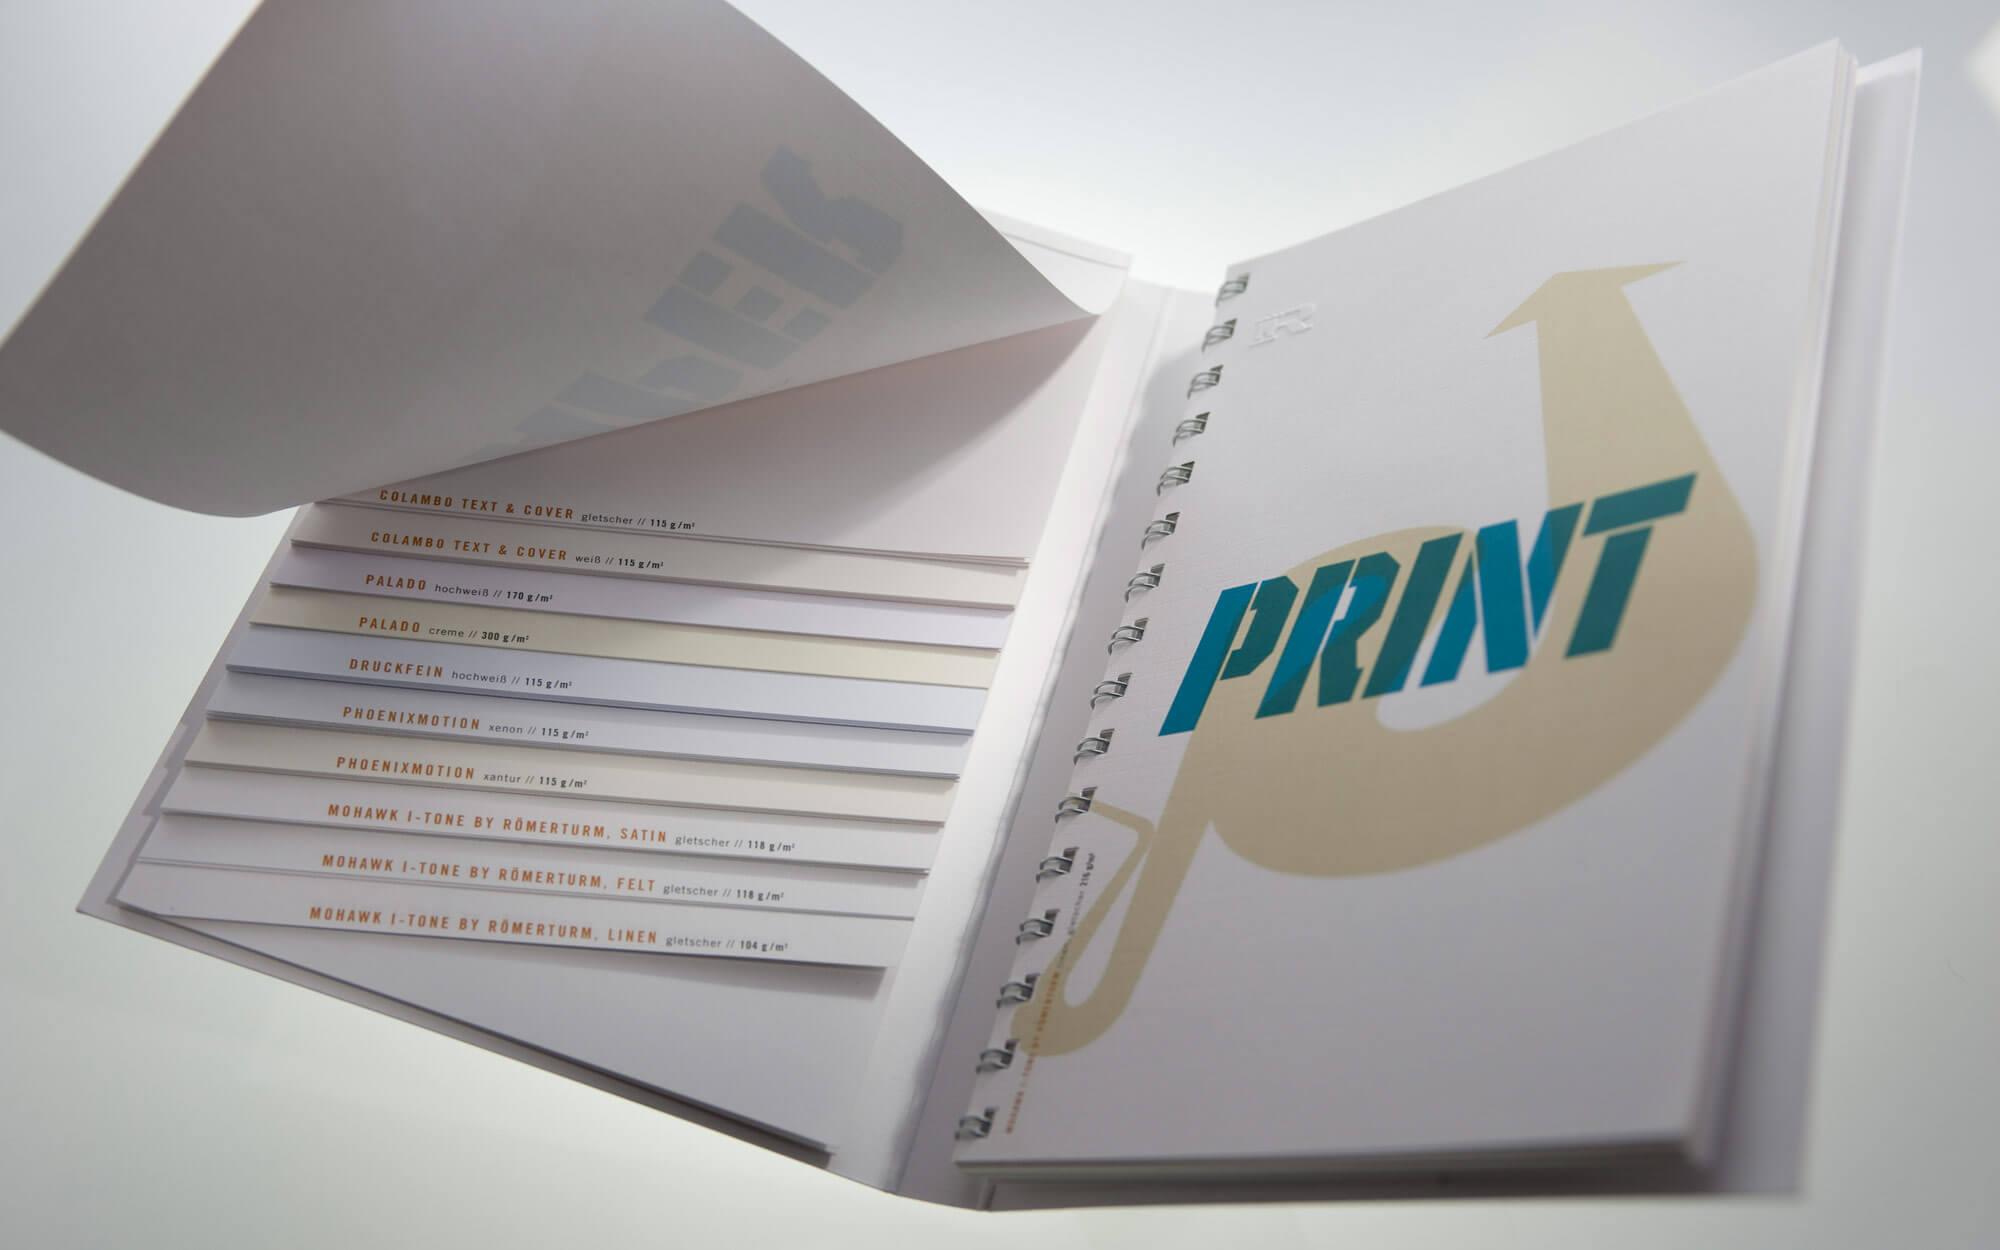 direct mailing, papier, corporate paper, veredelung, druckveredelung, story telling, Papiermuster, Musterbuch, Papierkolletion, Feinstpapier